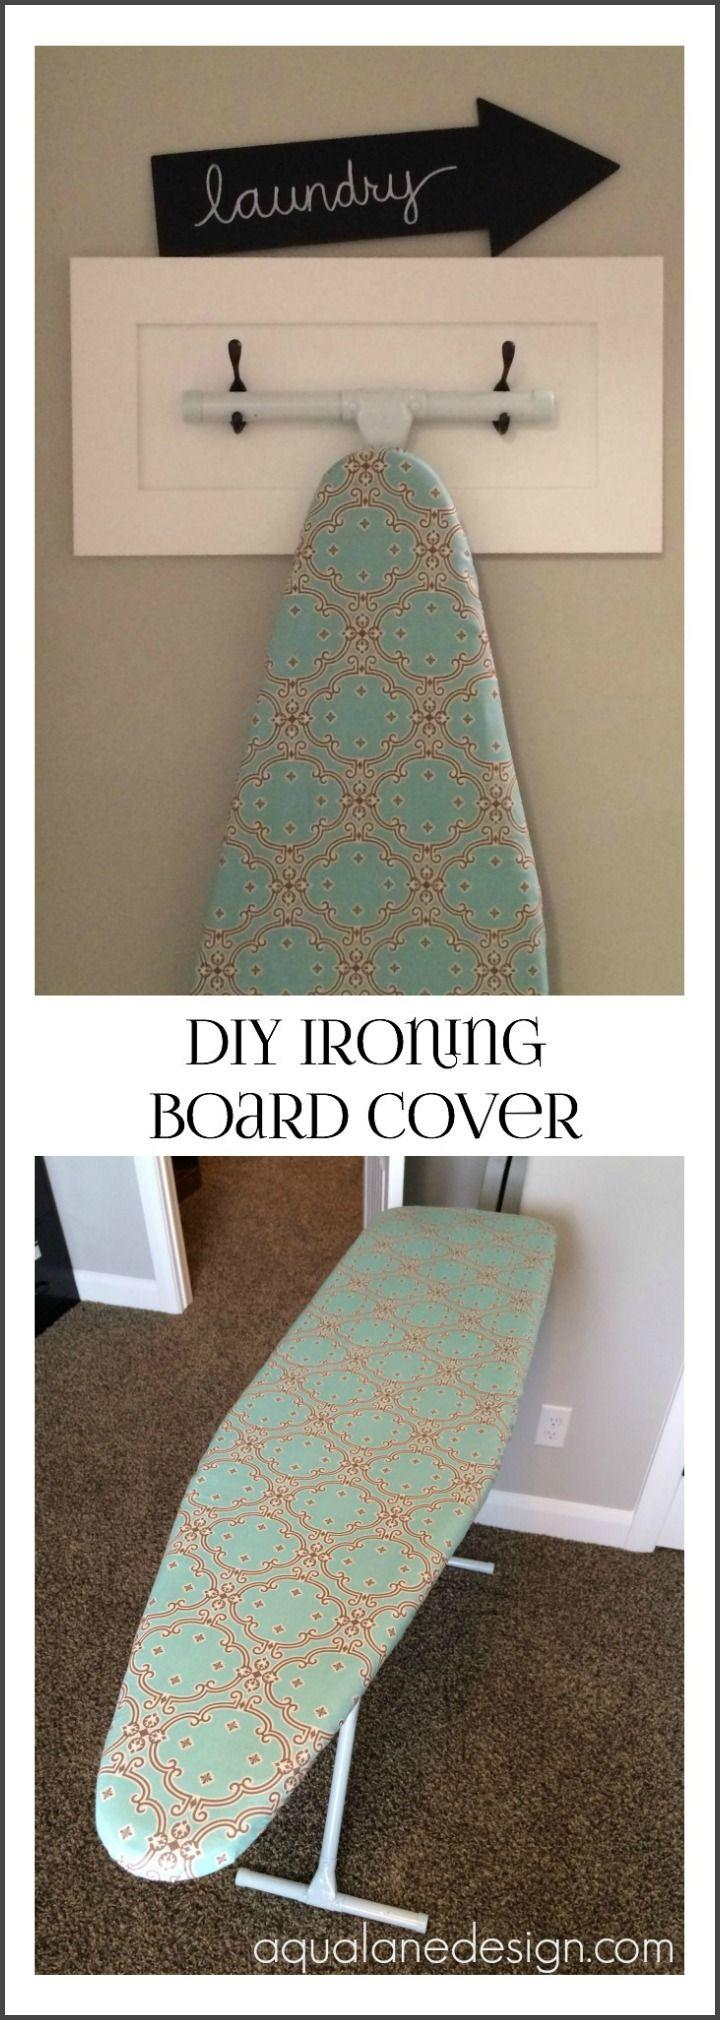 DIY Ironing Board Cover. Like the chalk arrow | Diy ...